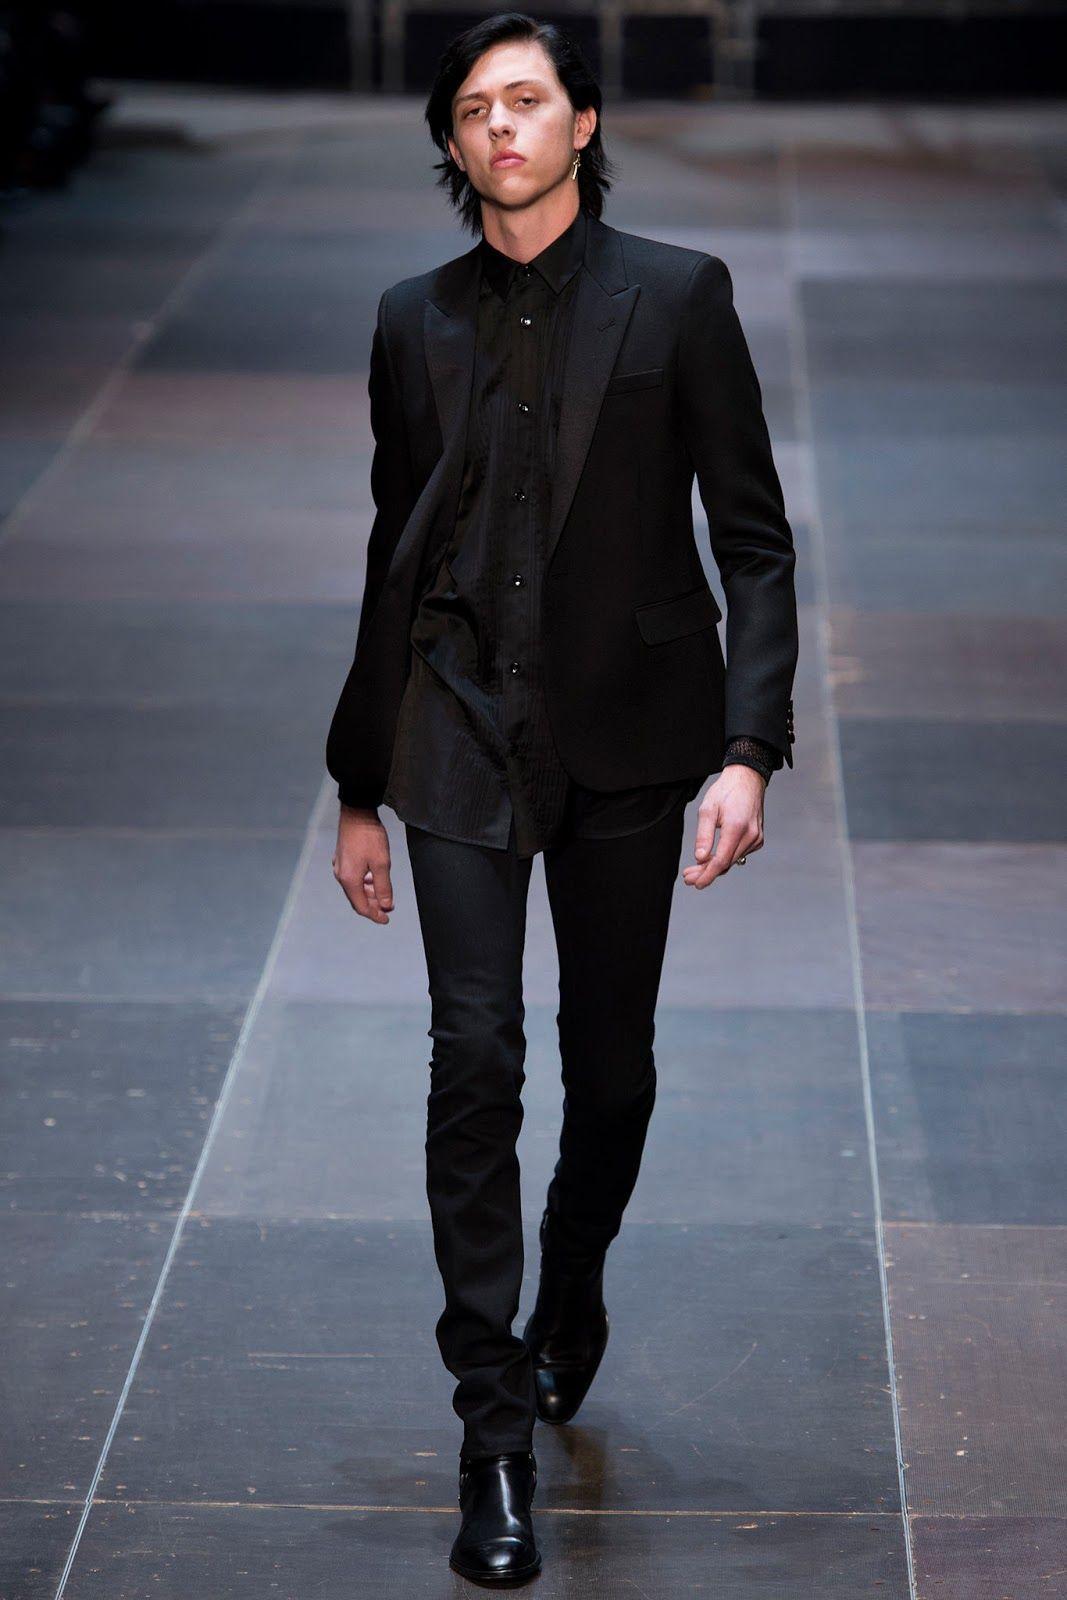 cdb59629fdc Wyatt Shears Saint Laurent Handtasche, Men's Fashion, Paris Fashion, High  Fashion, Fashion